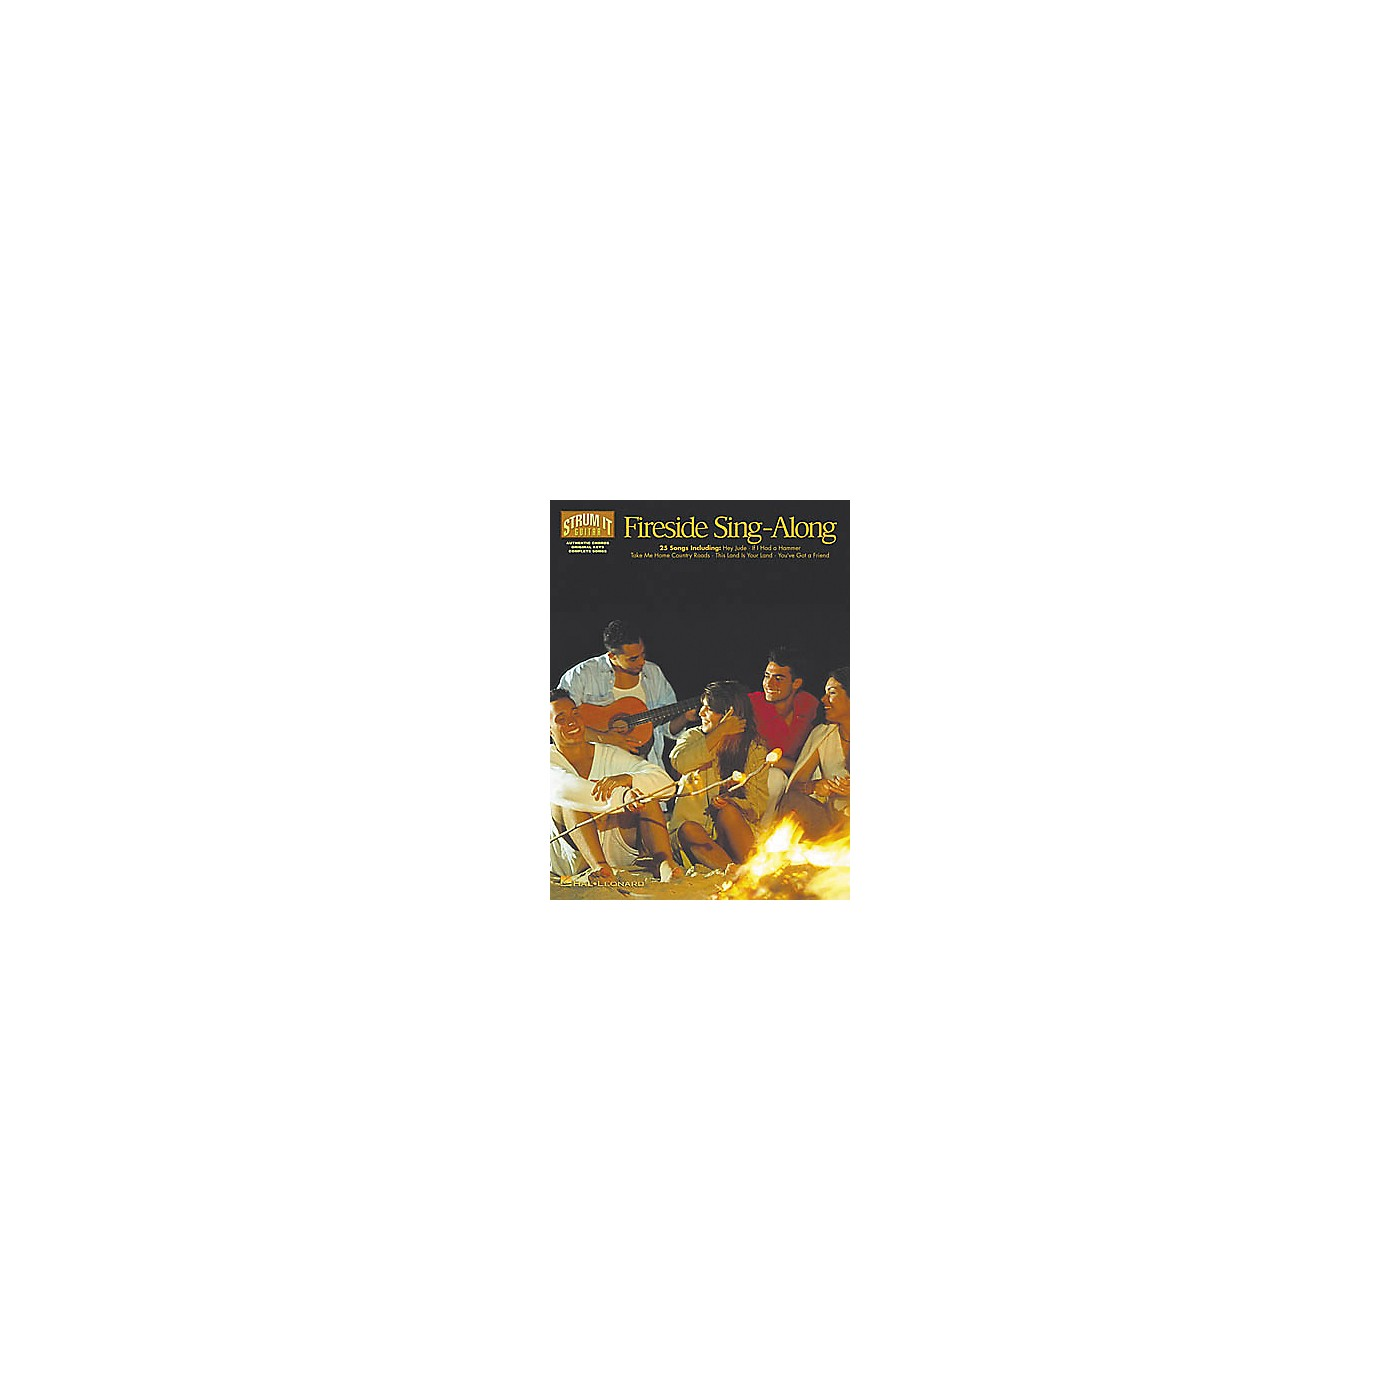 Hal Leonard Fireside Sing-Along Strum It Guitar Book thumbnail